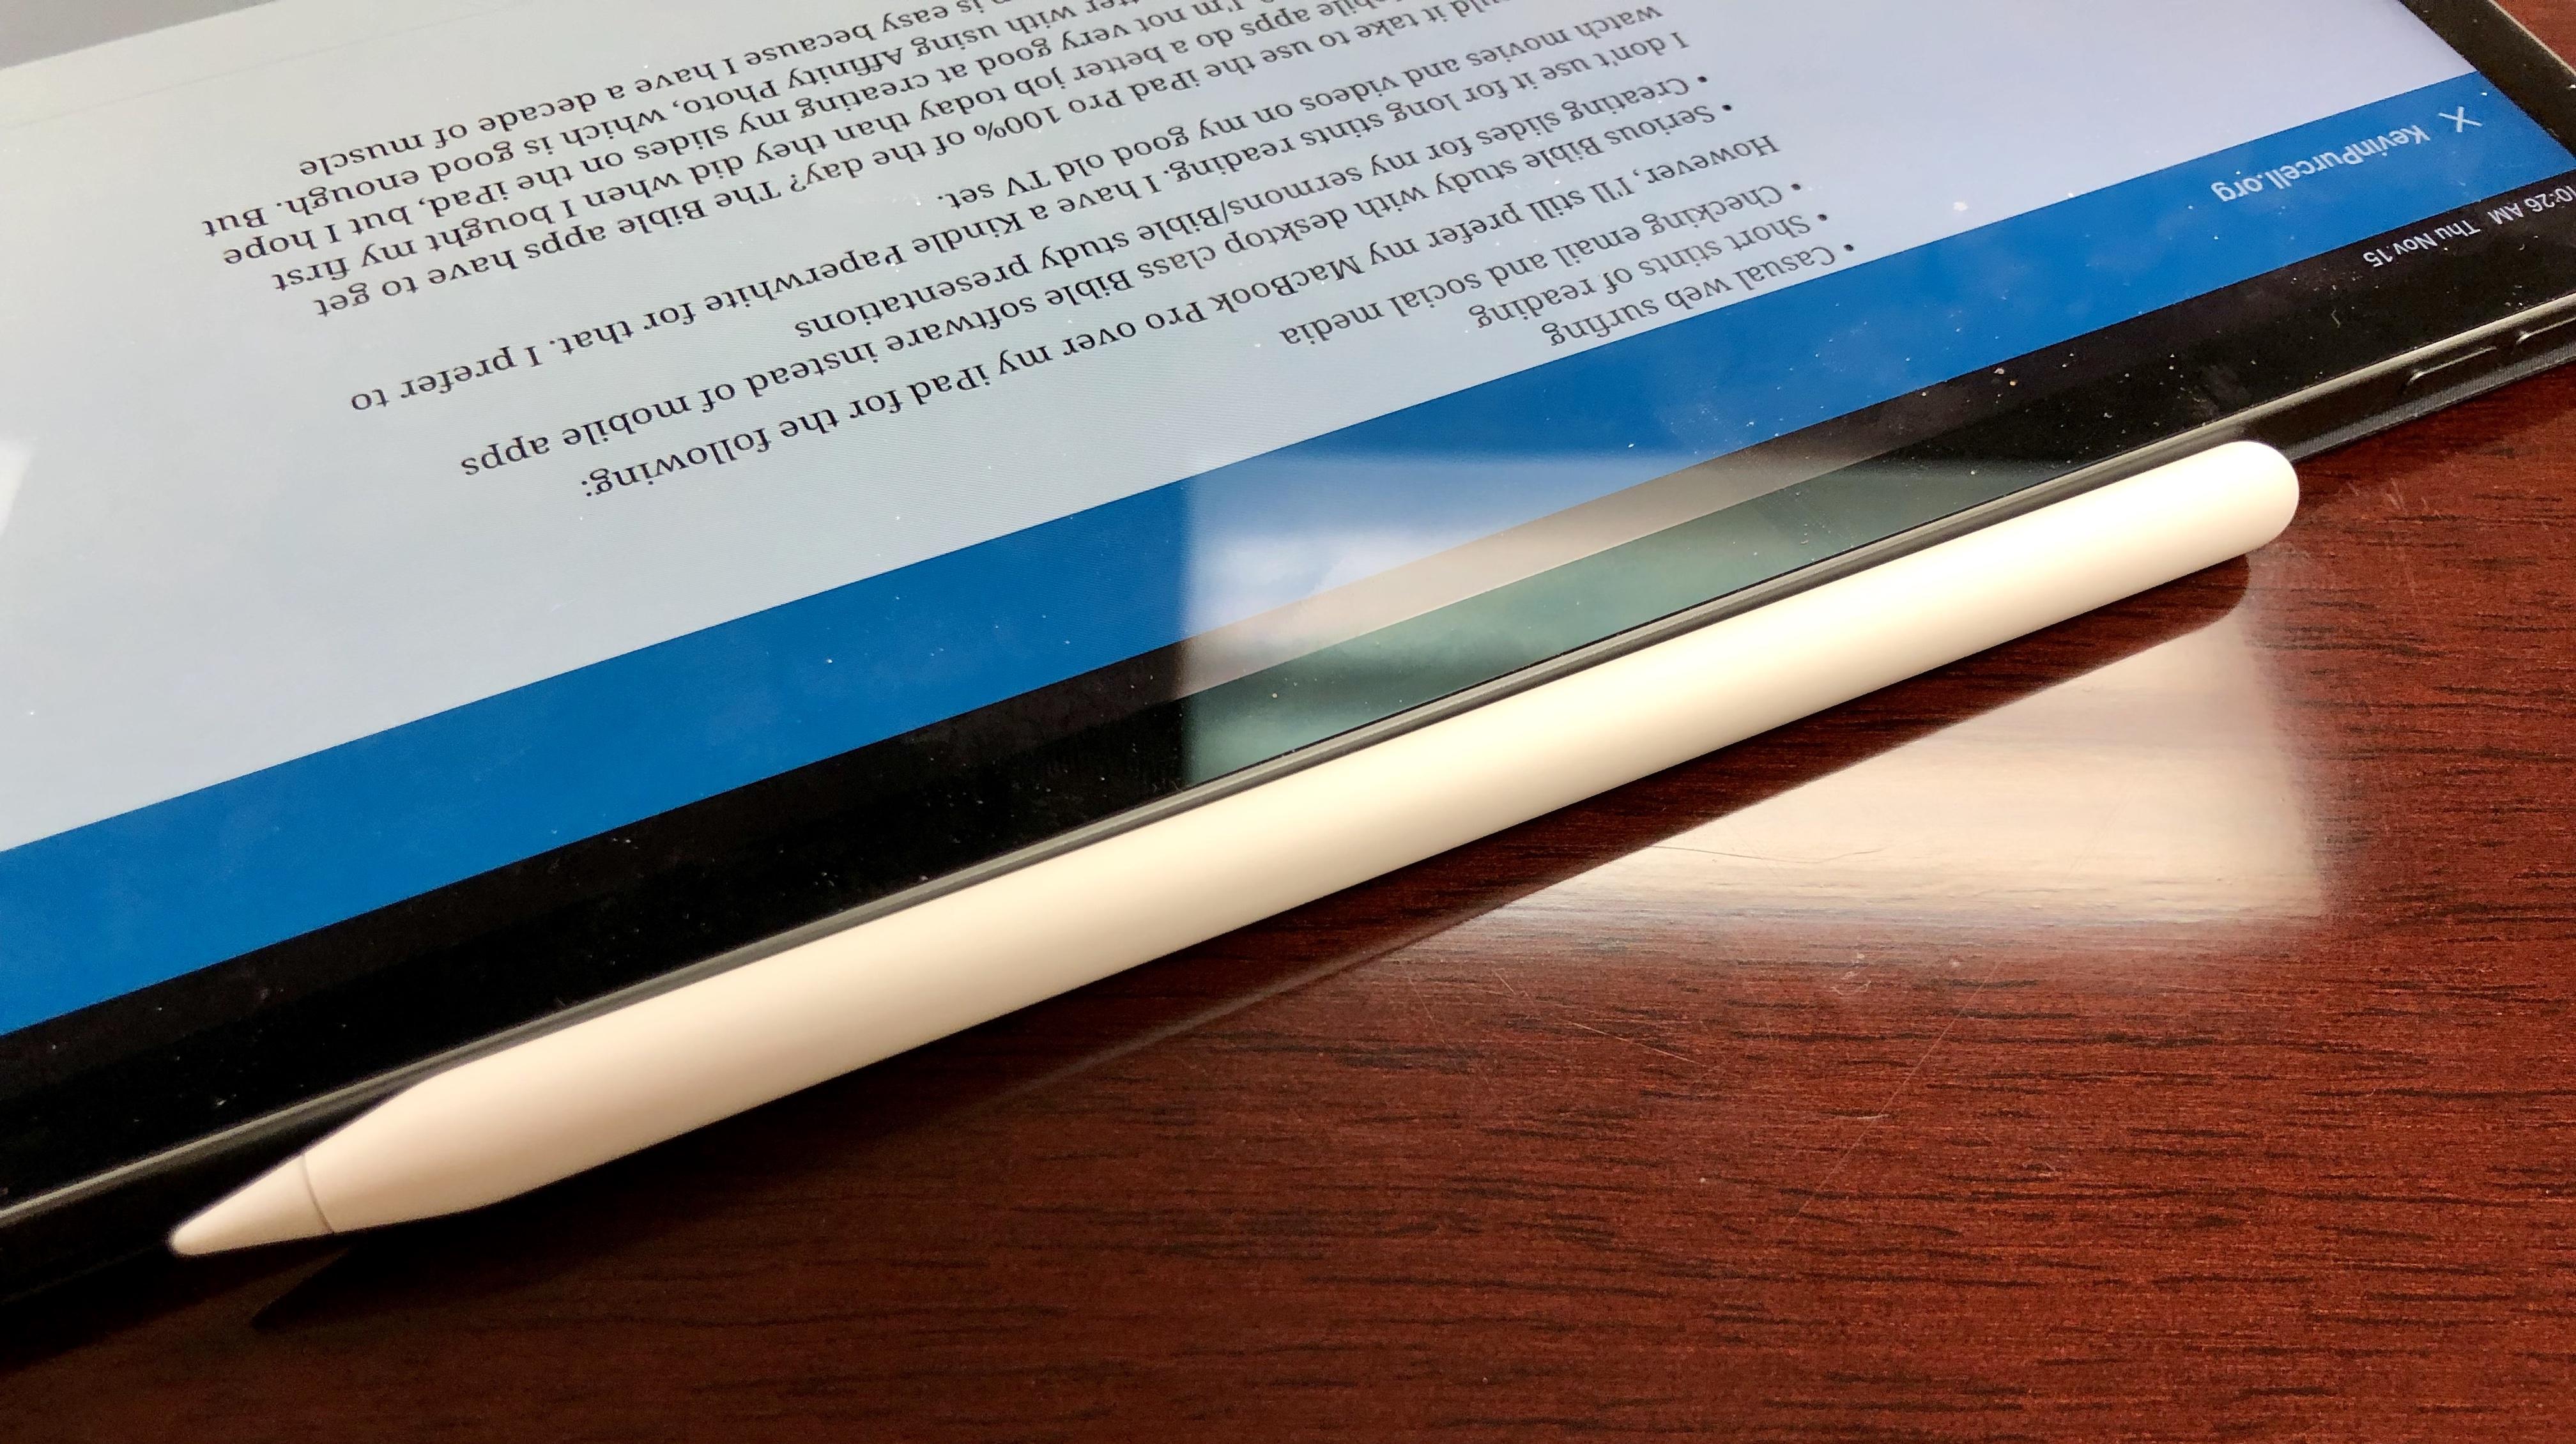 New 2018 Apple iPad Pro for Bible Study